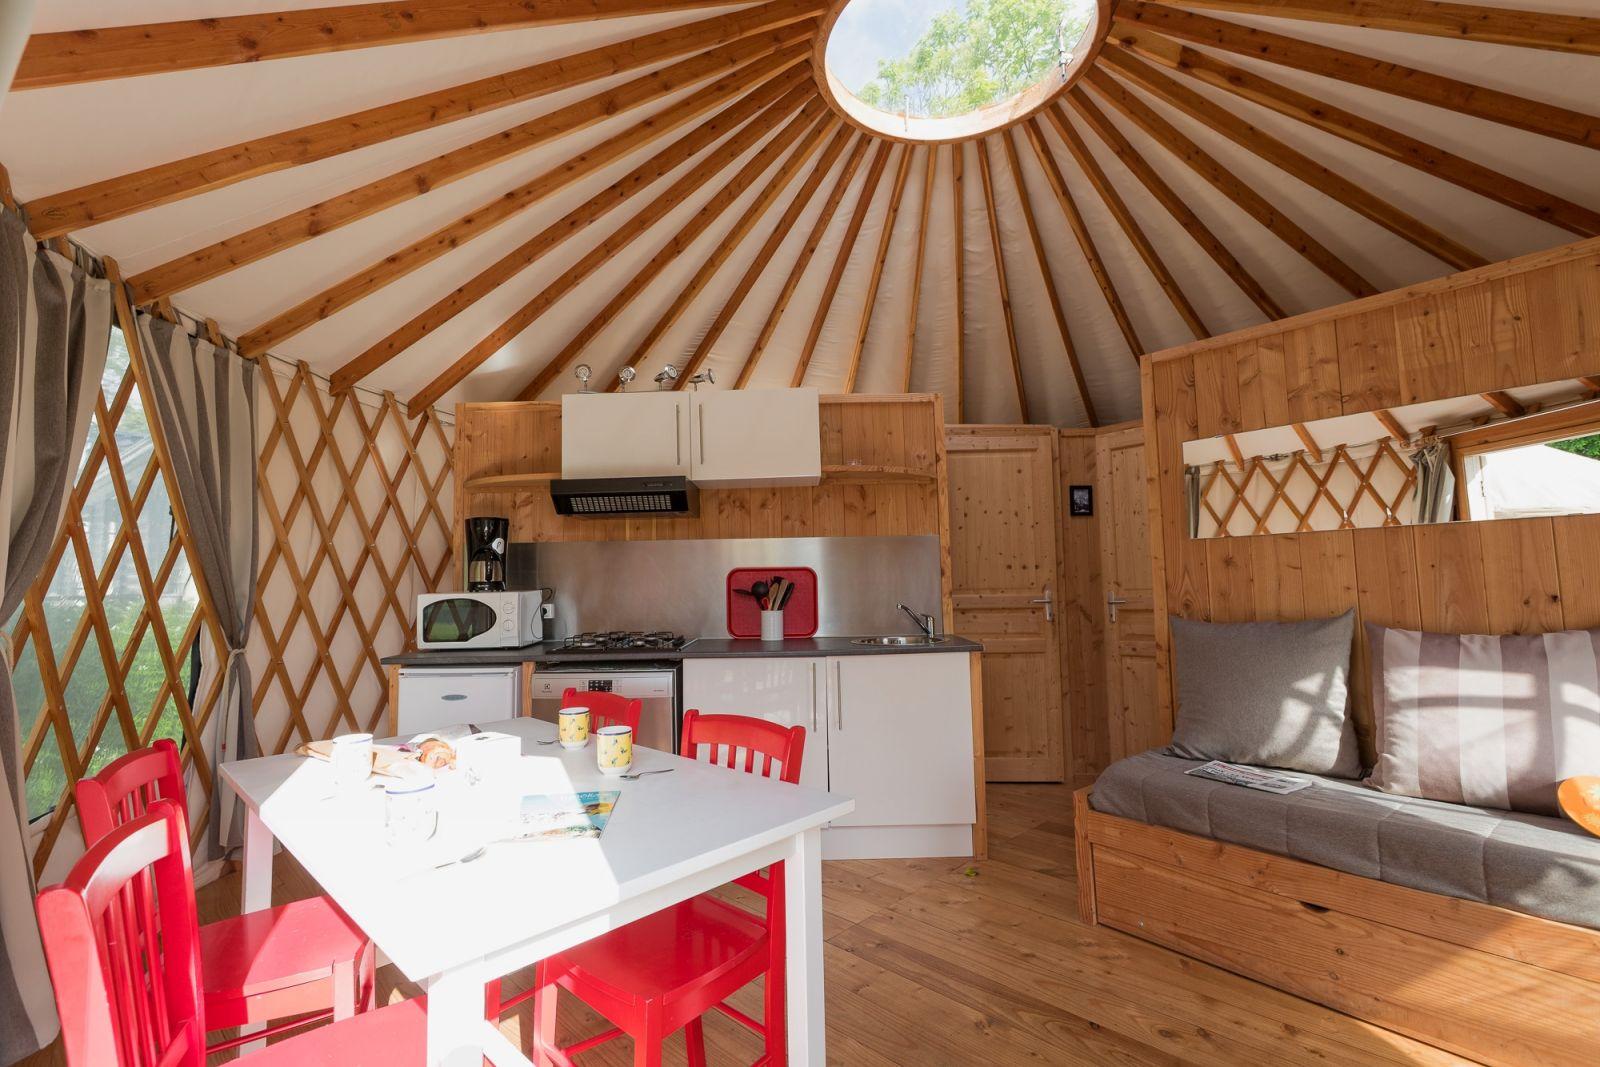 Luxe yurt